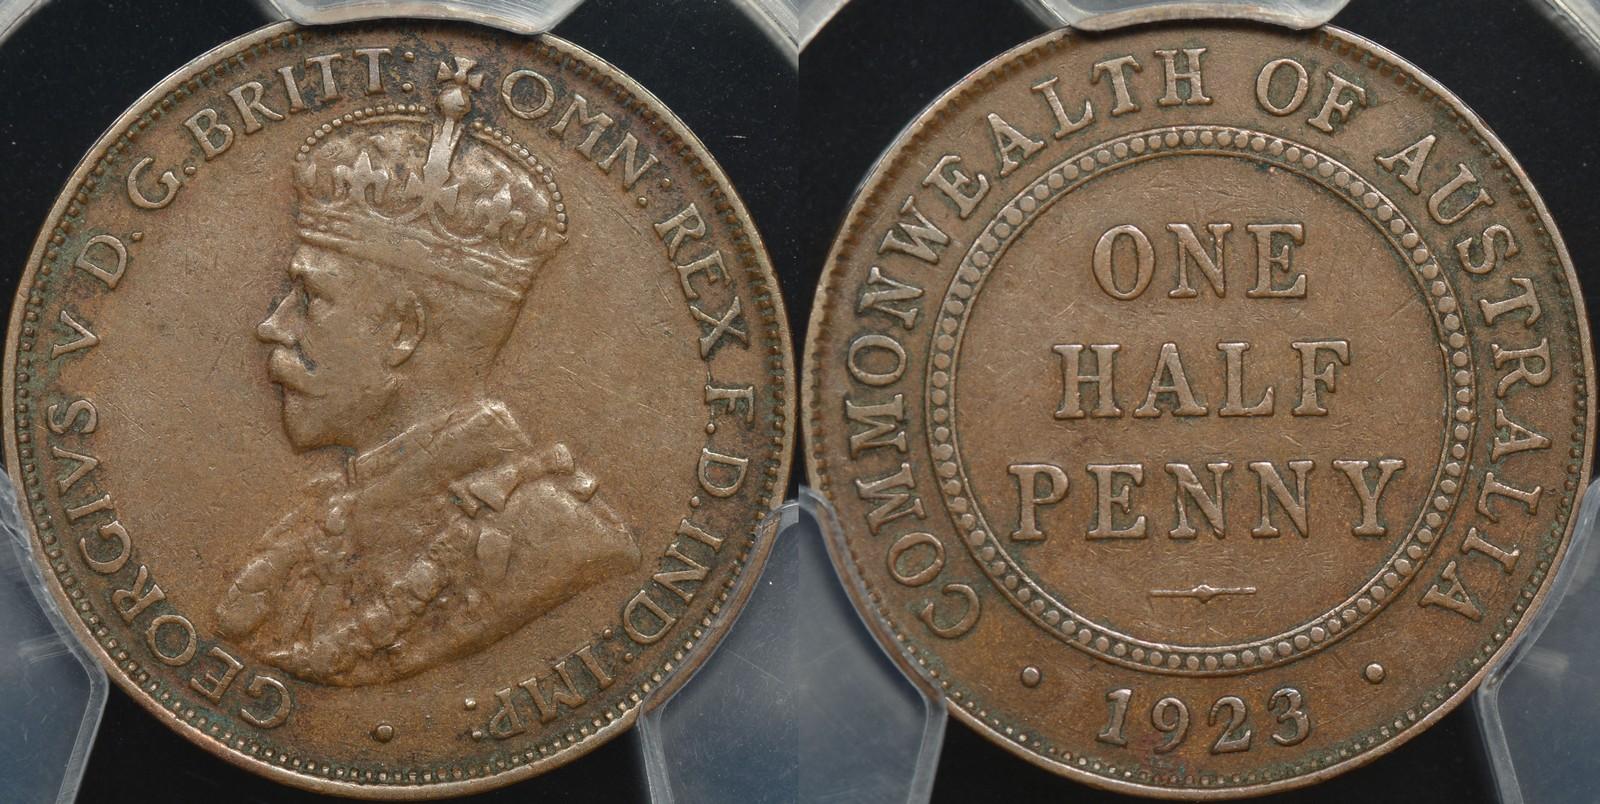 Australia Penny 1923